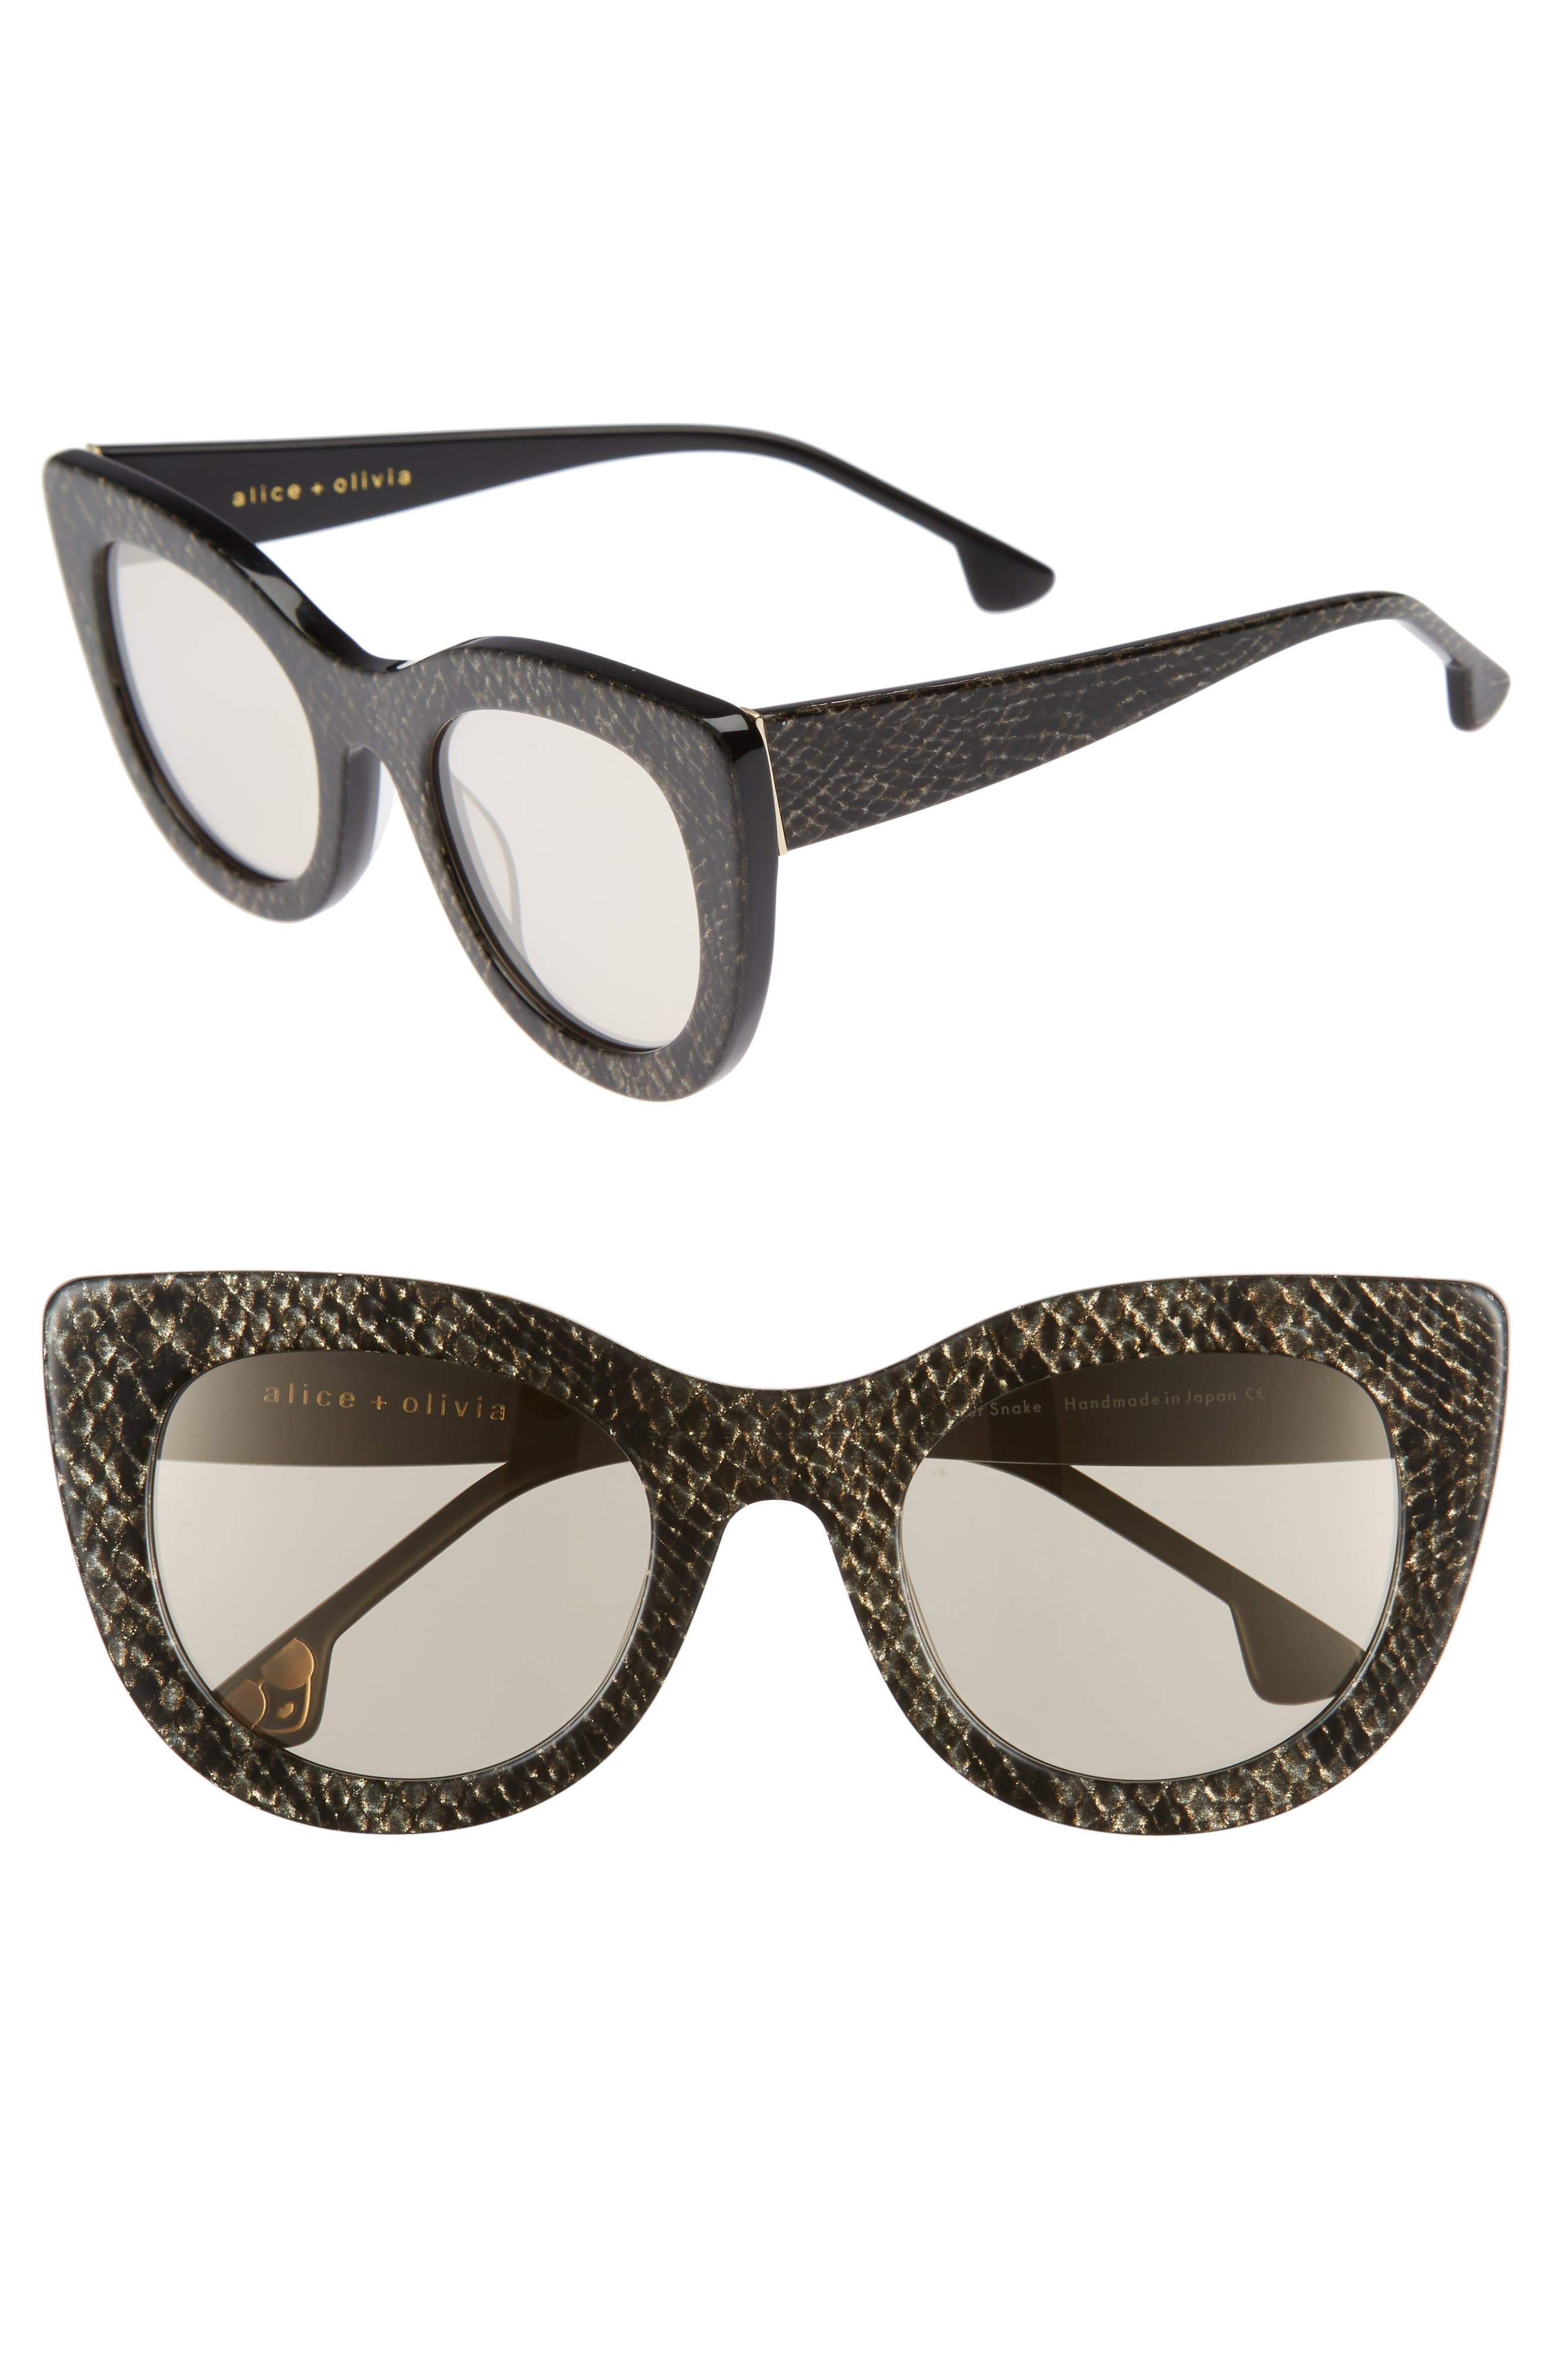 Delancey 51mm Cat Eye Sunglasses,                         Main,                         color, Silver Snake